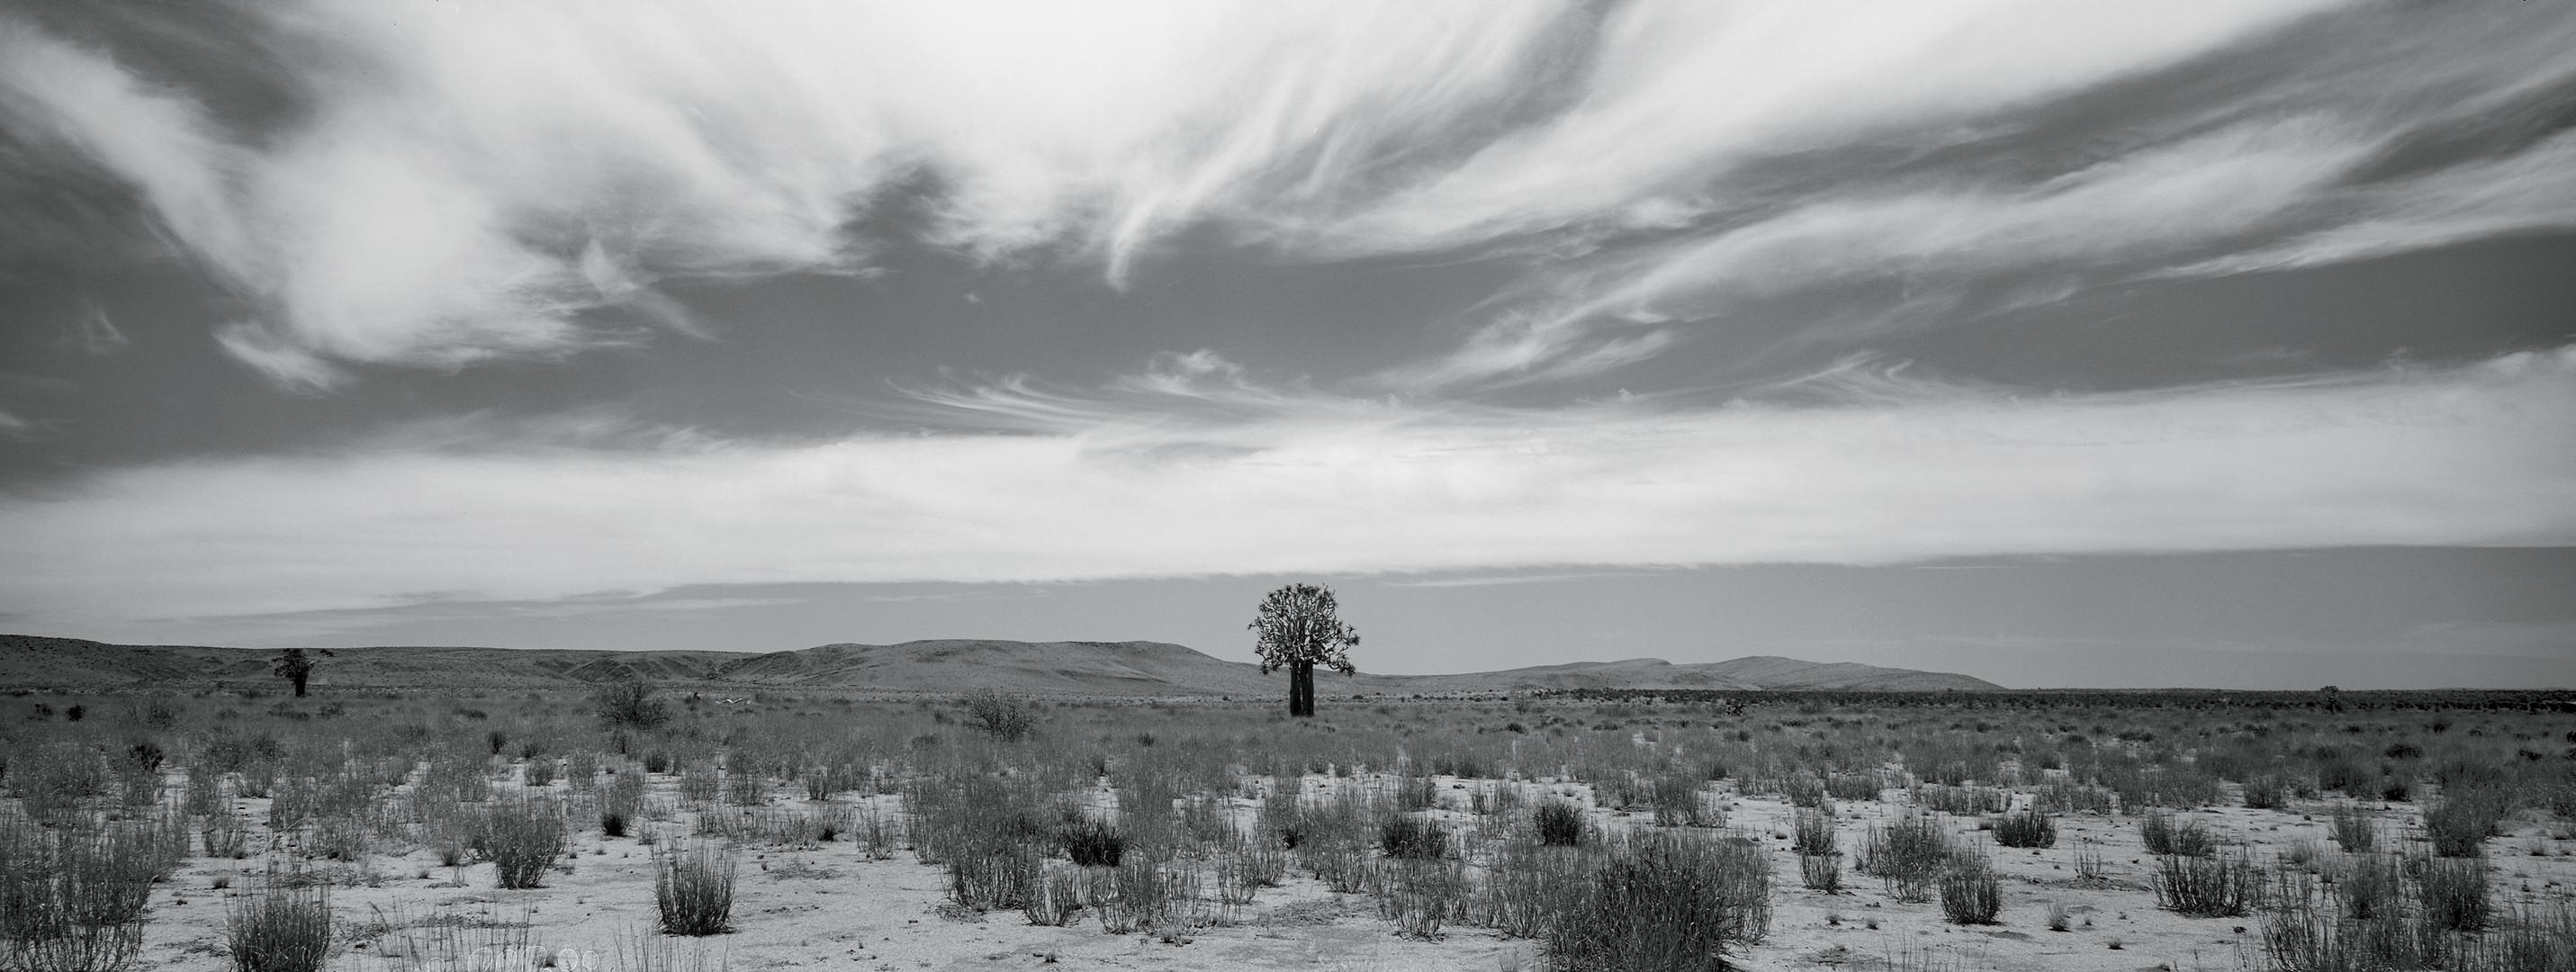 Southern Africa Portfolio-26.jpg